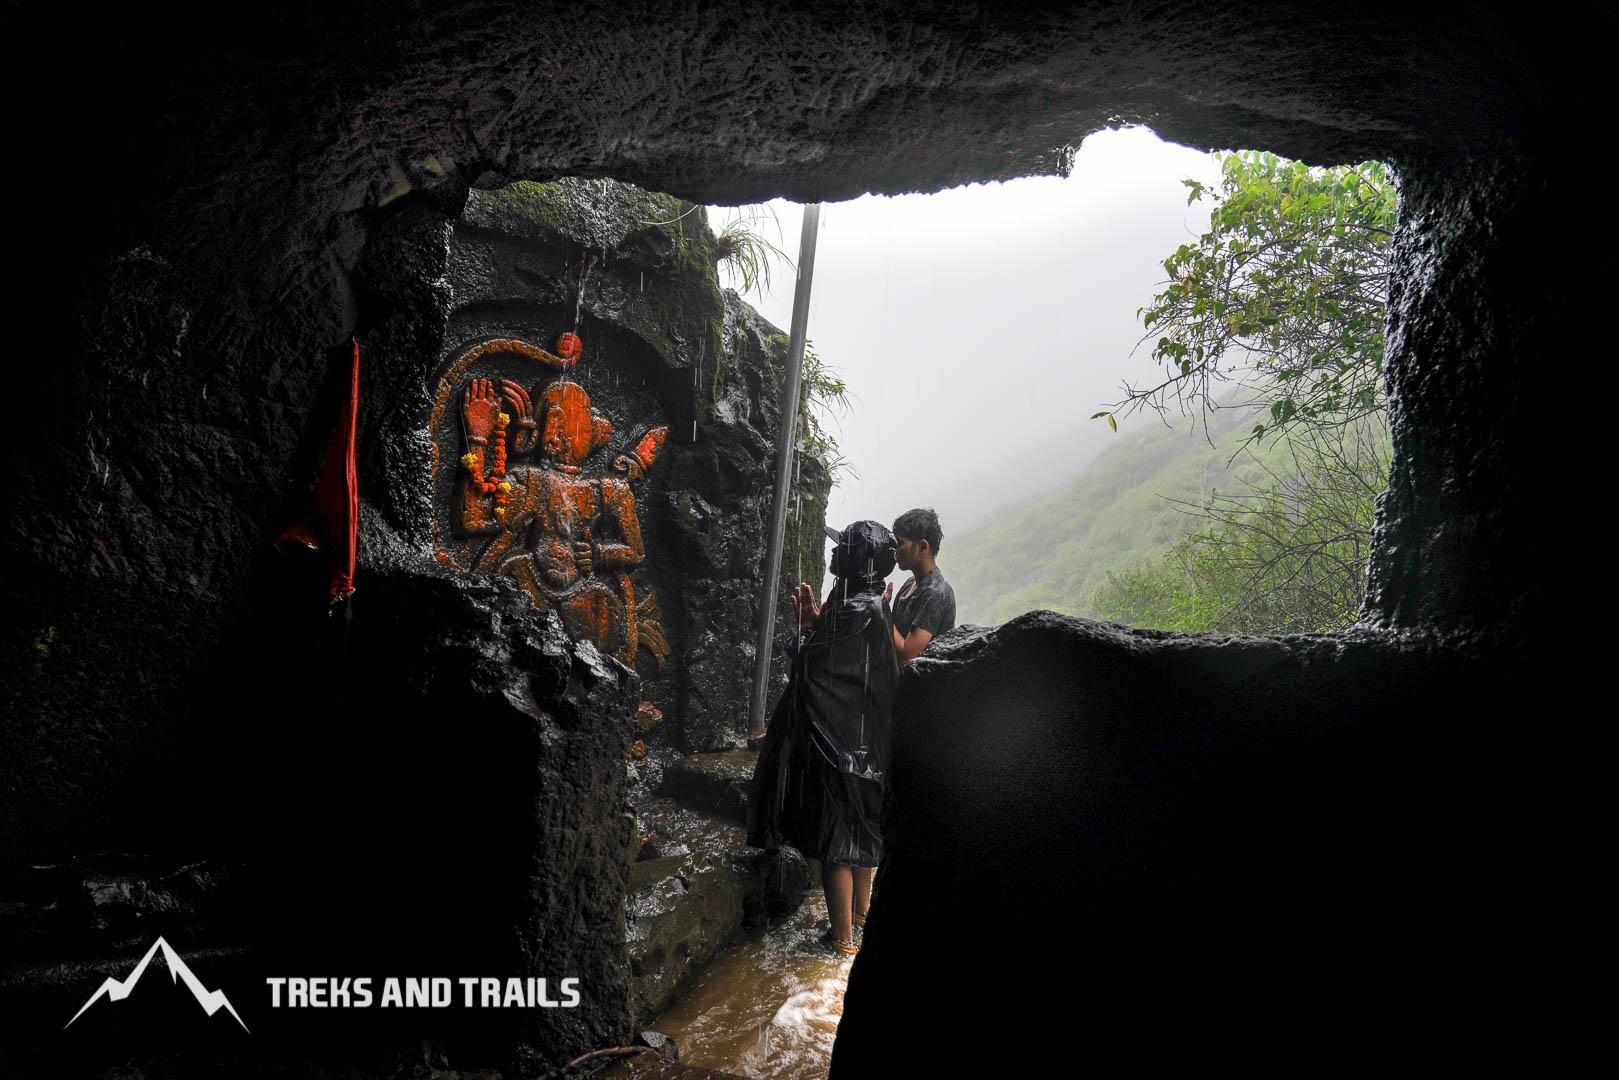 Visapur-Fort-Trek-Blog